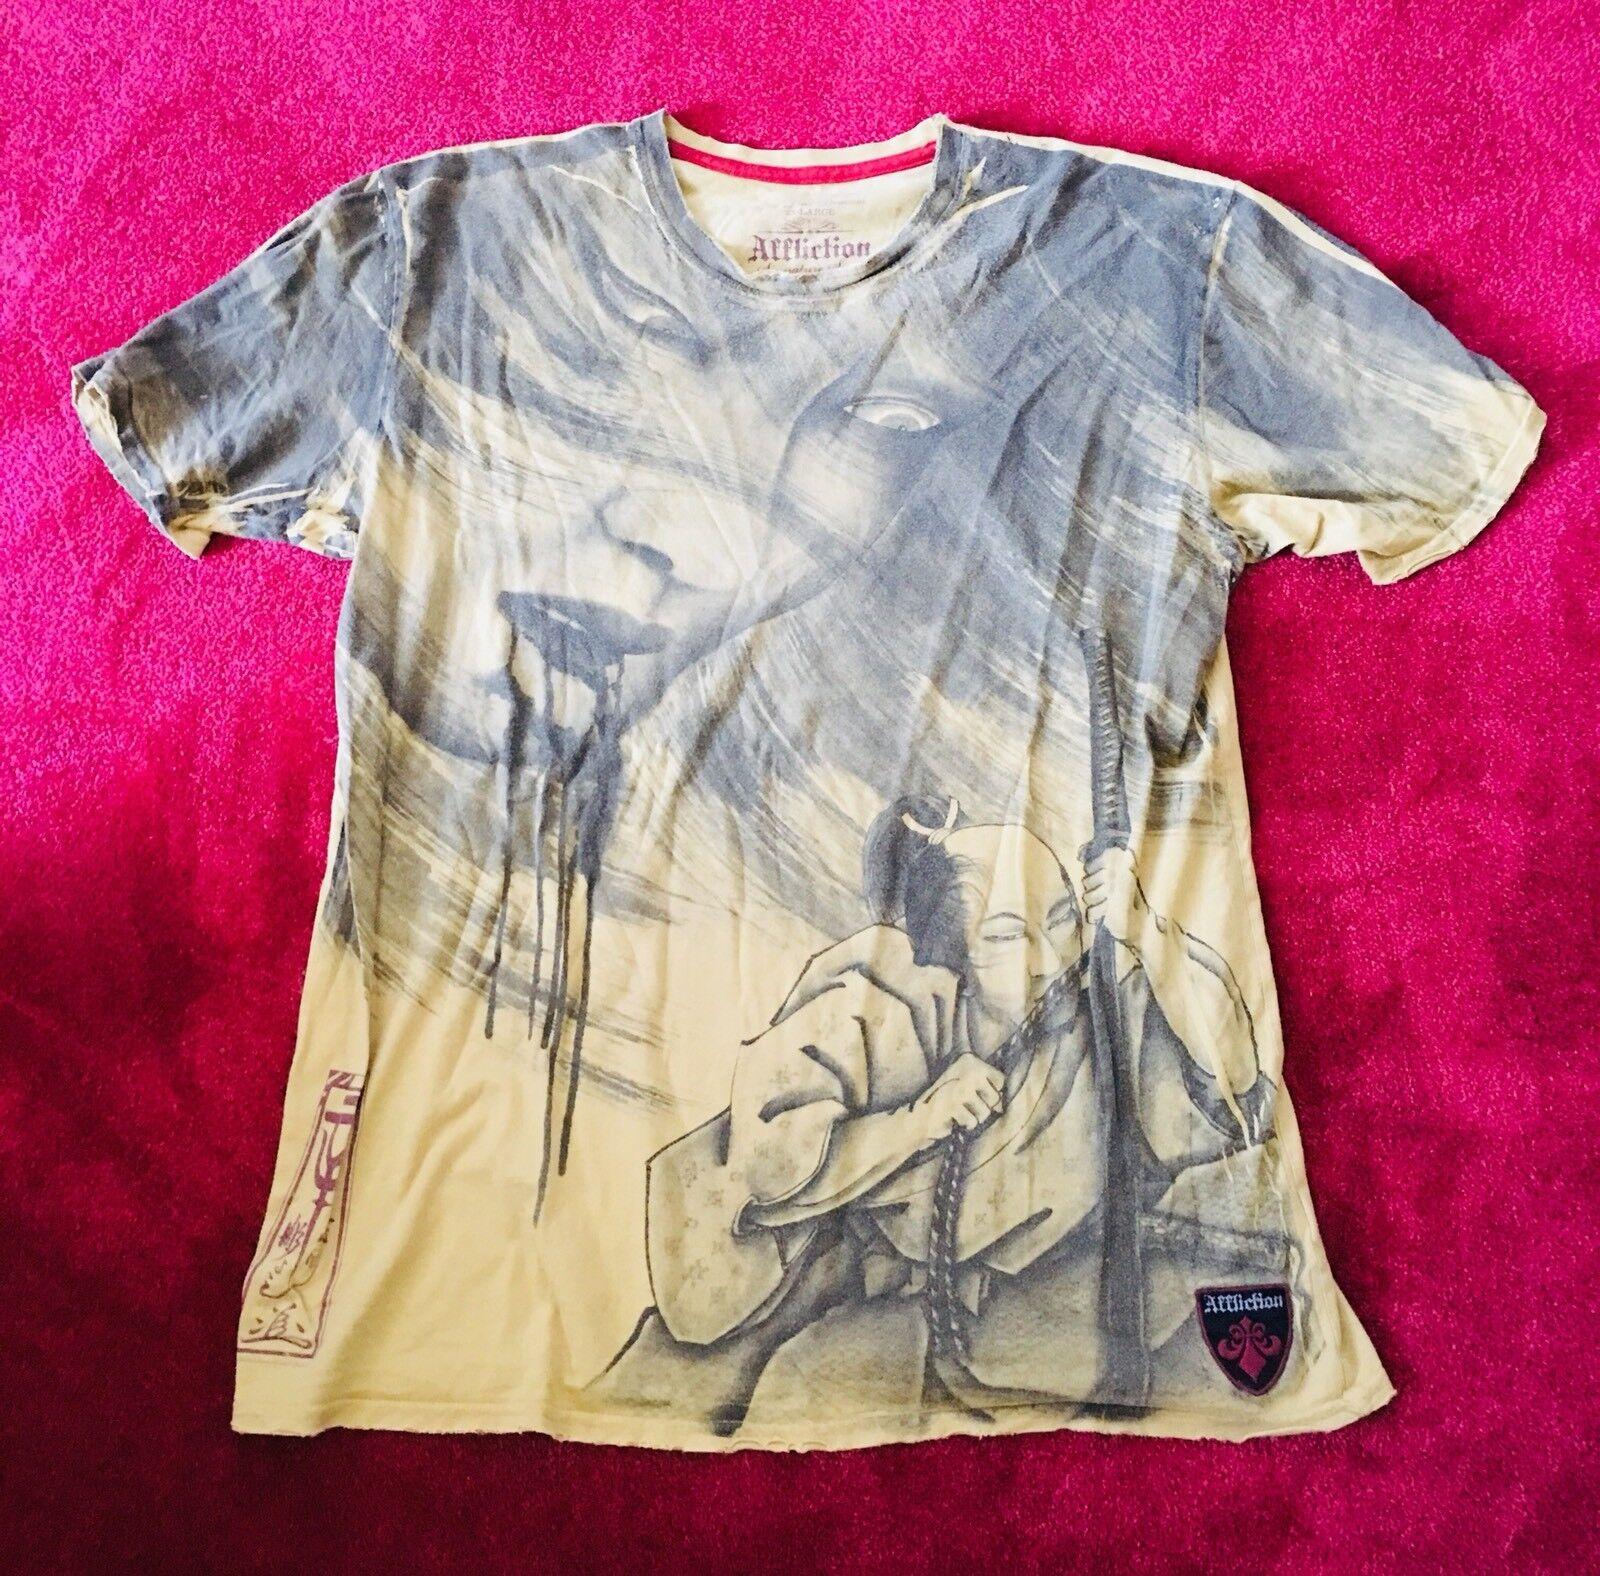 TOP Affliction T Shirt, XXL, Limited Edition, Horiyoshi III, Yokohama, NP